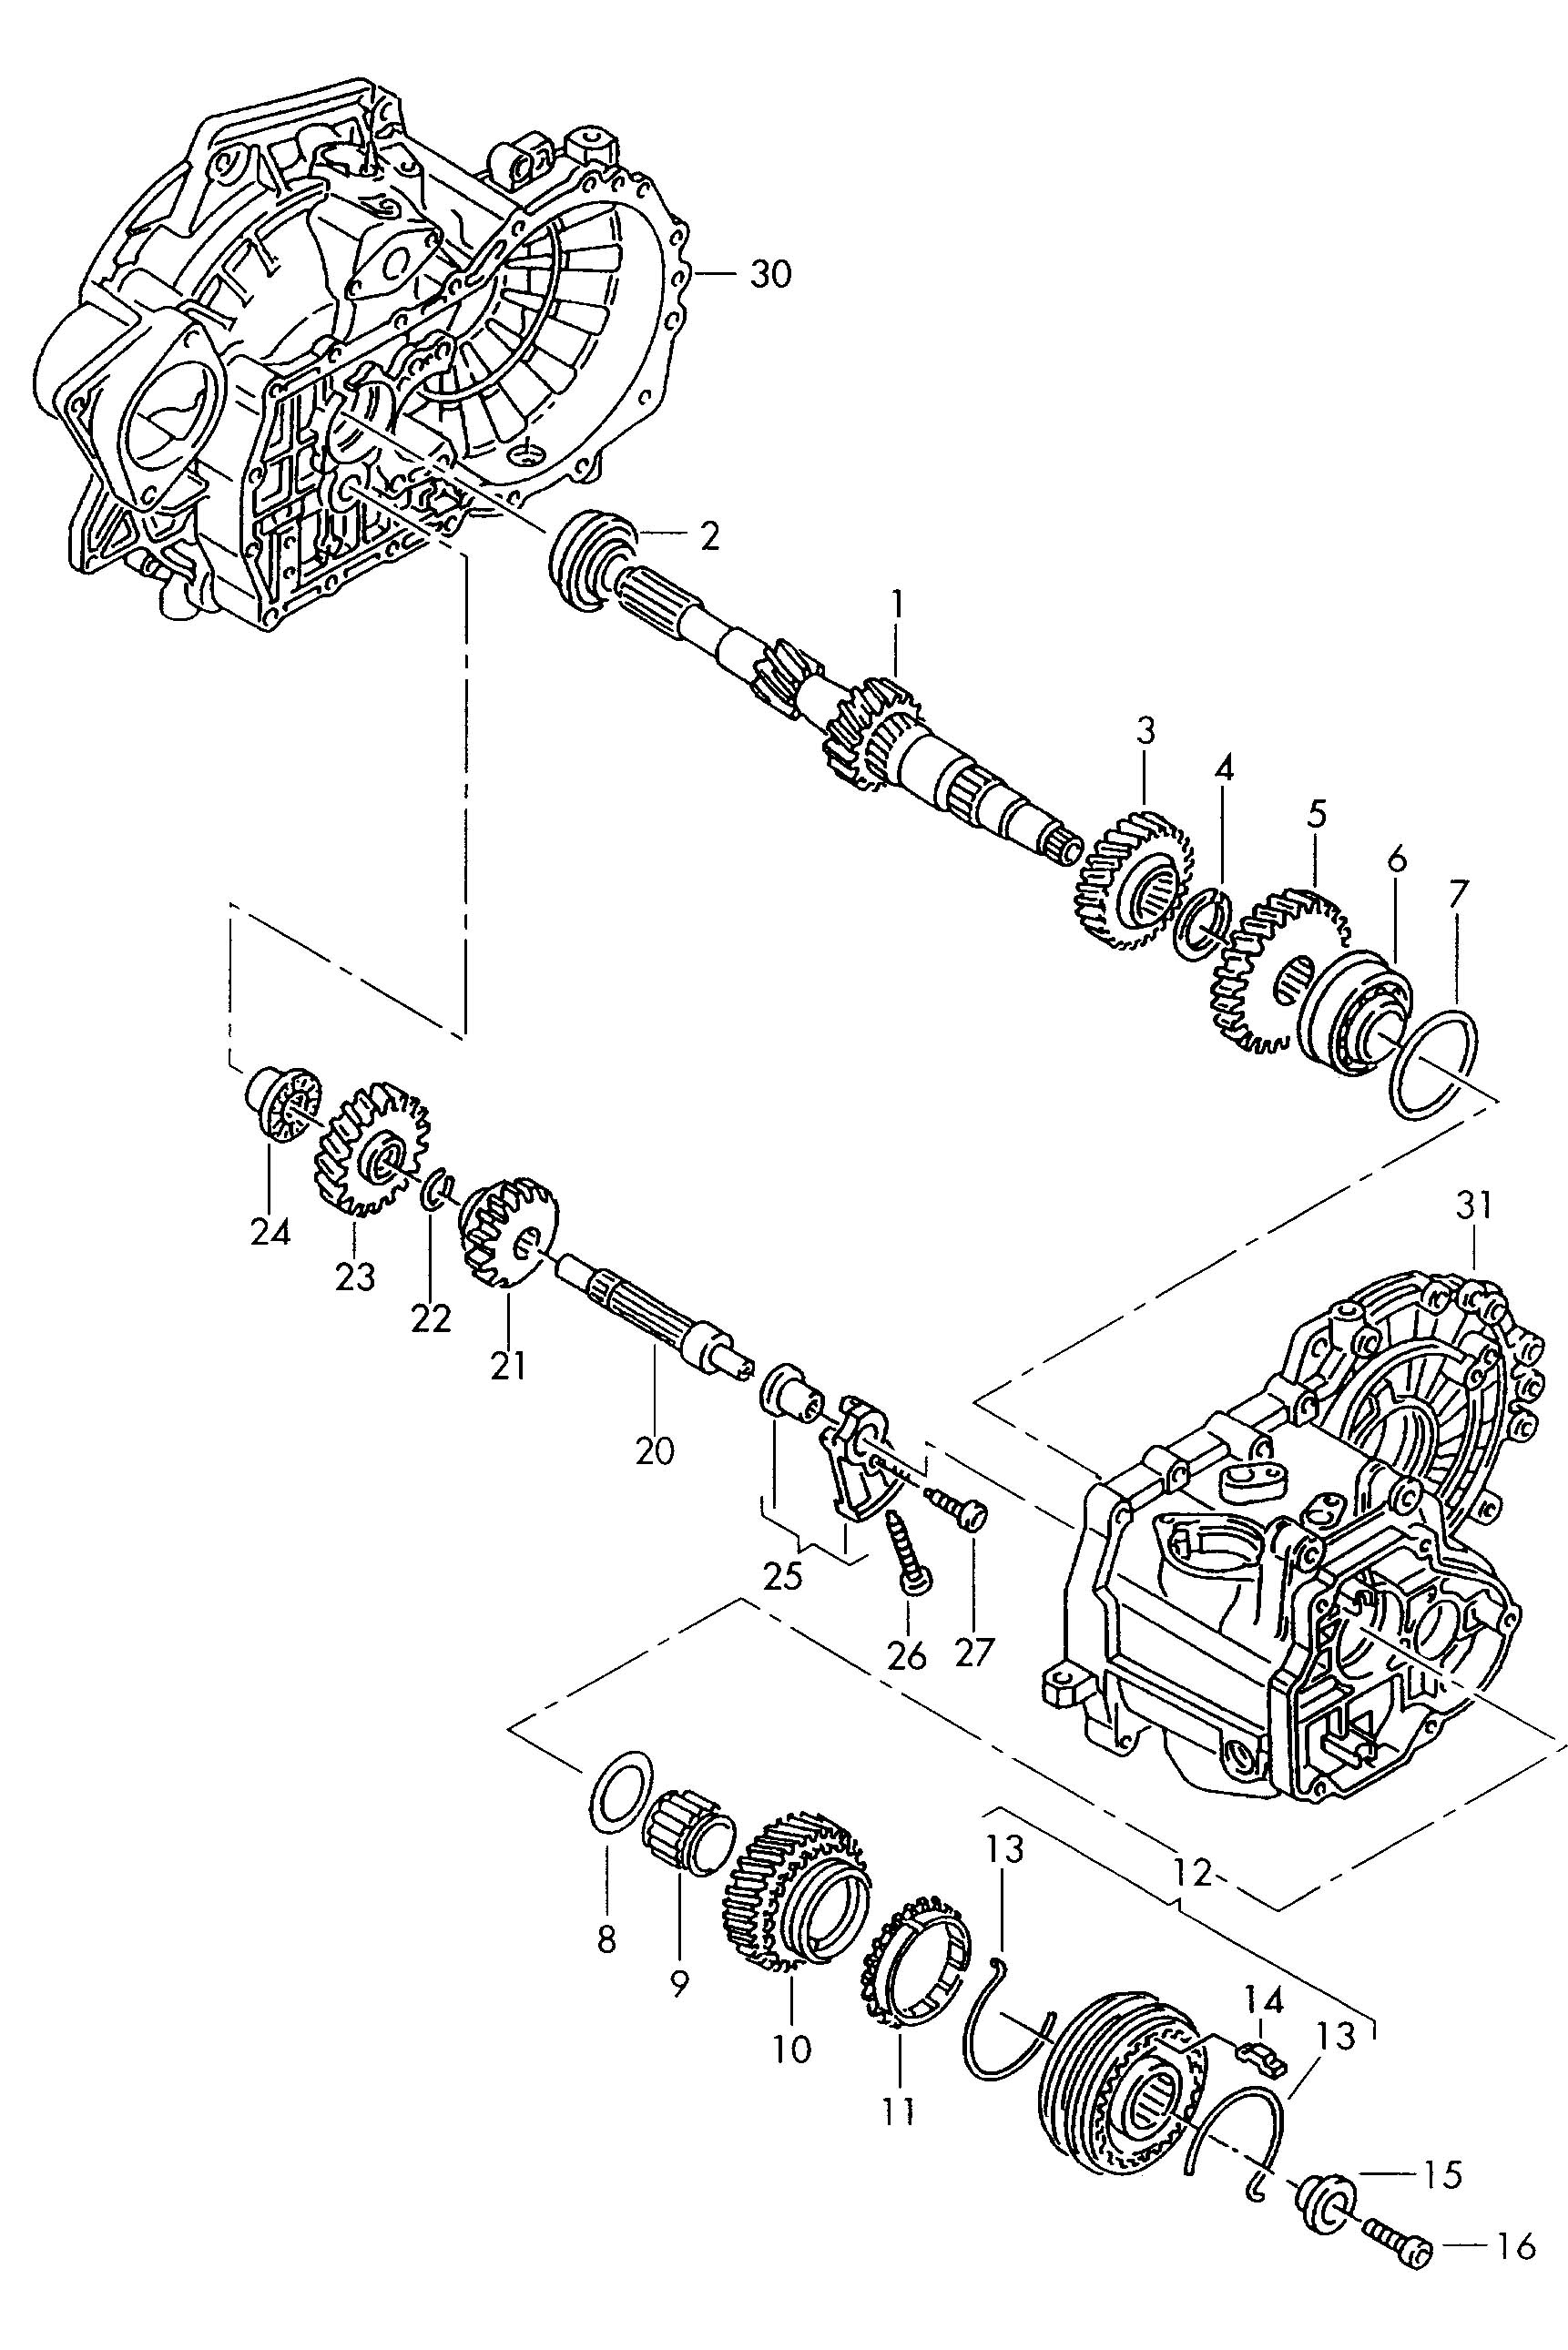 2001 Jetta Vr6 Engine Electrical Diagram 2001 Jetta 2.0